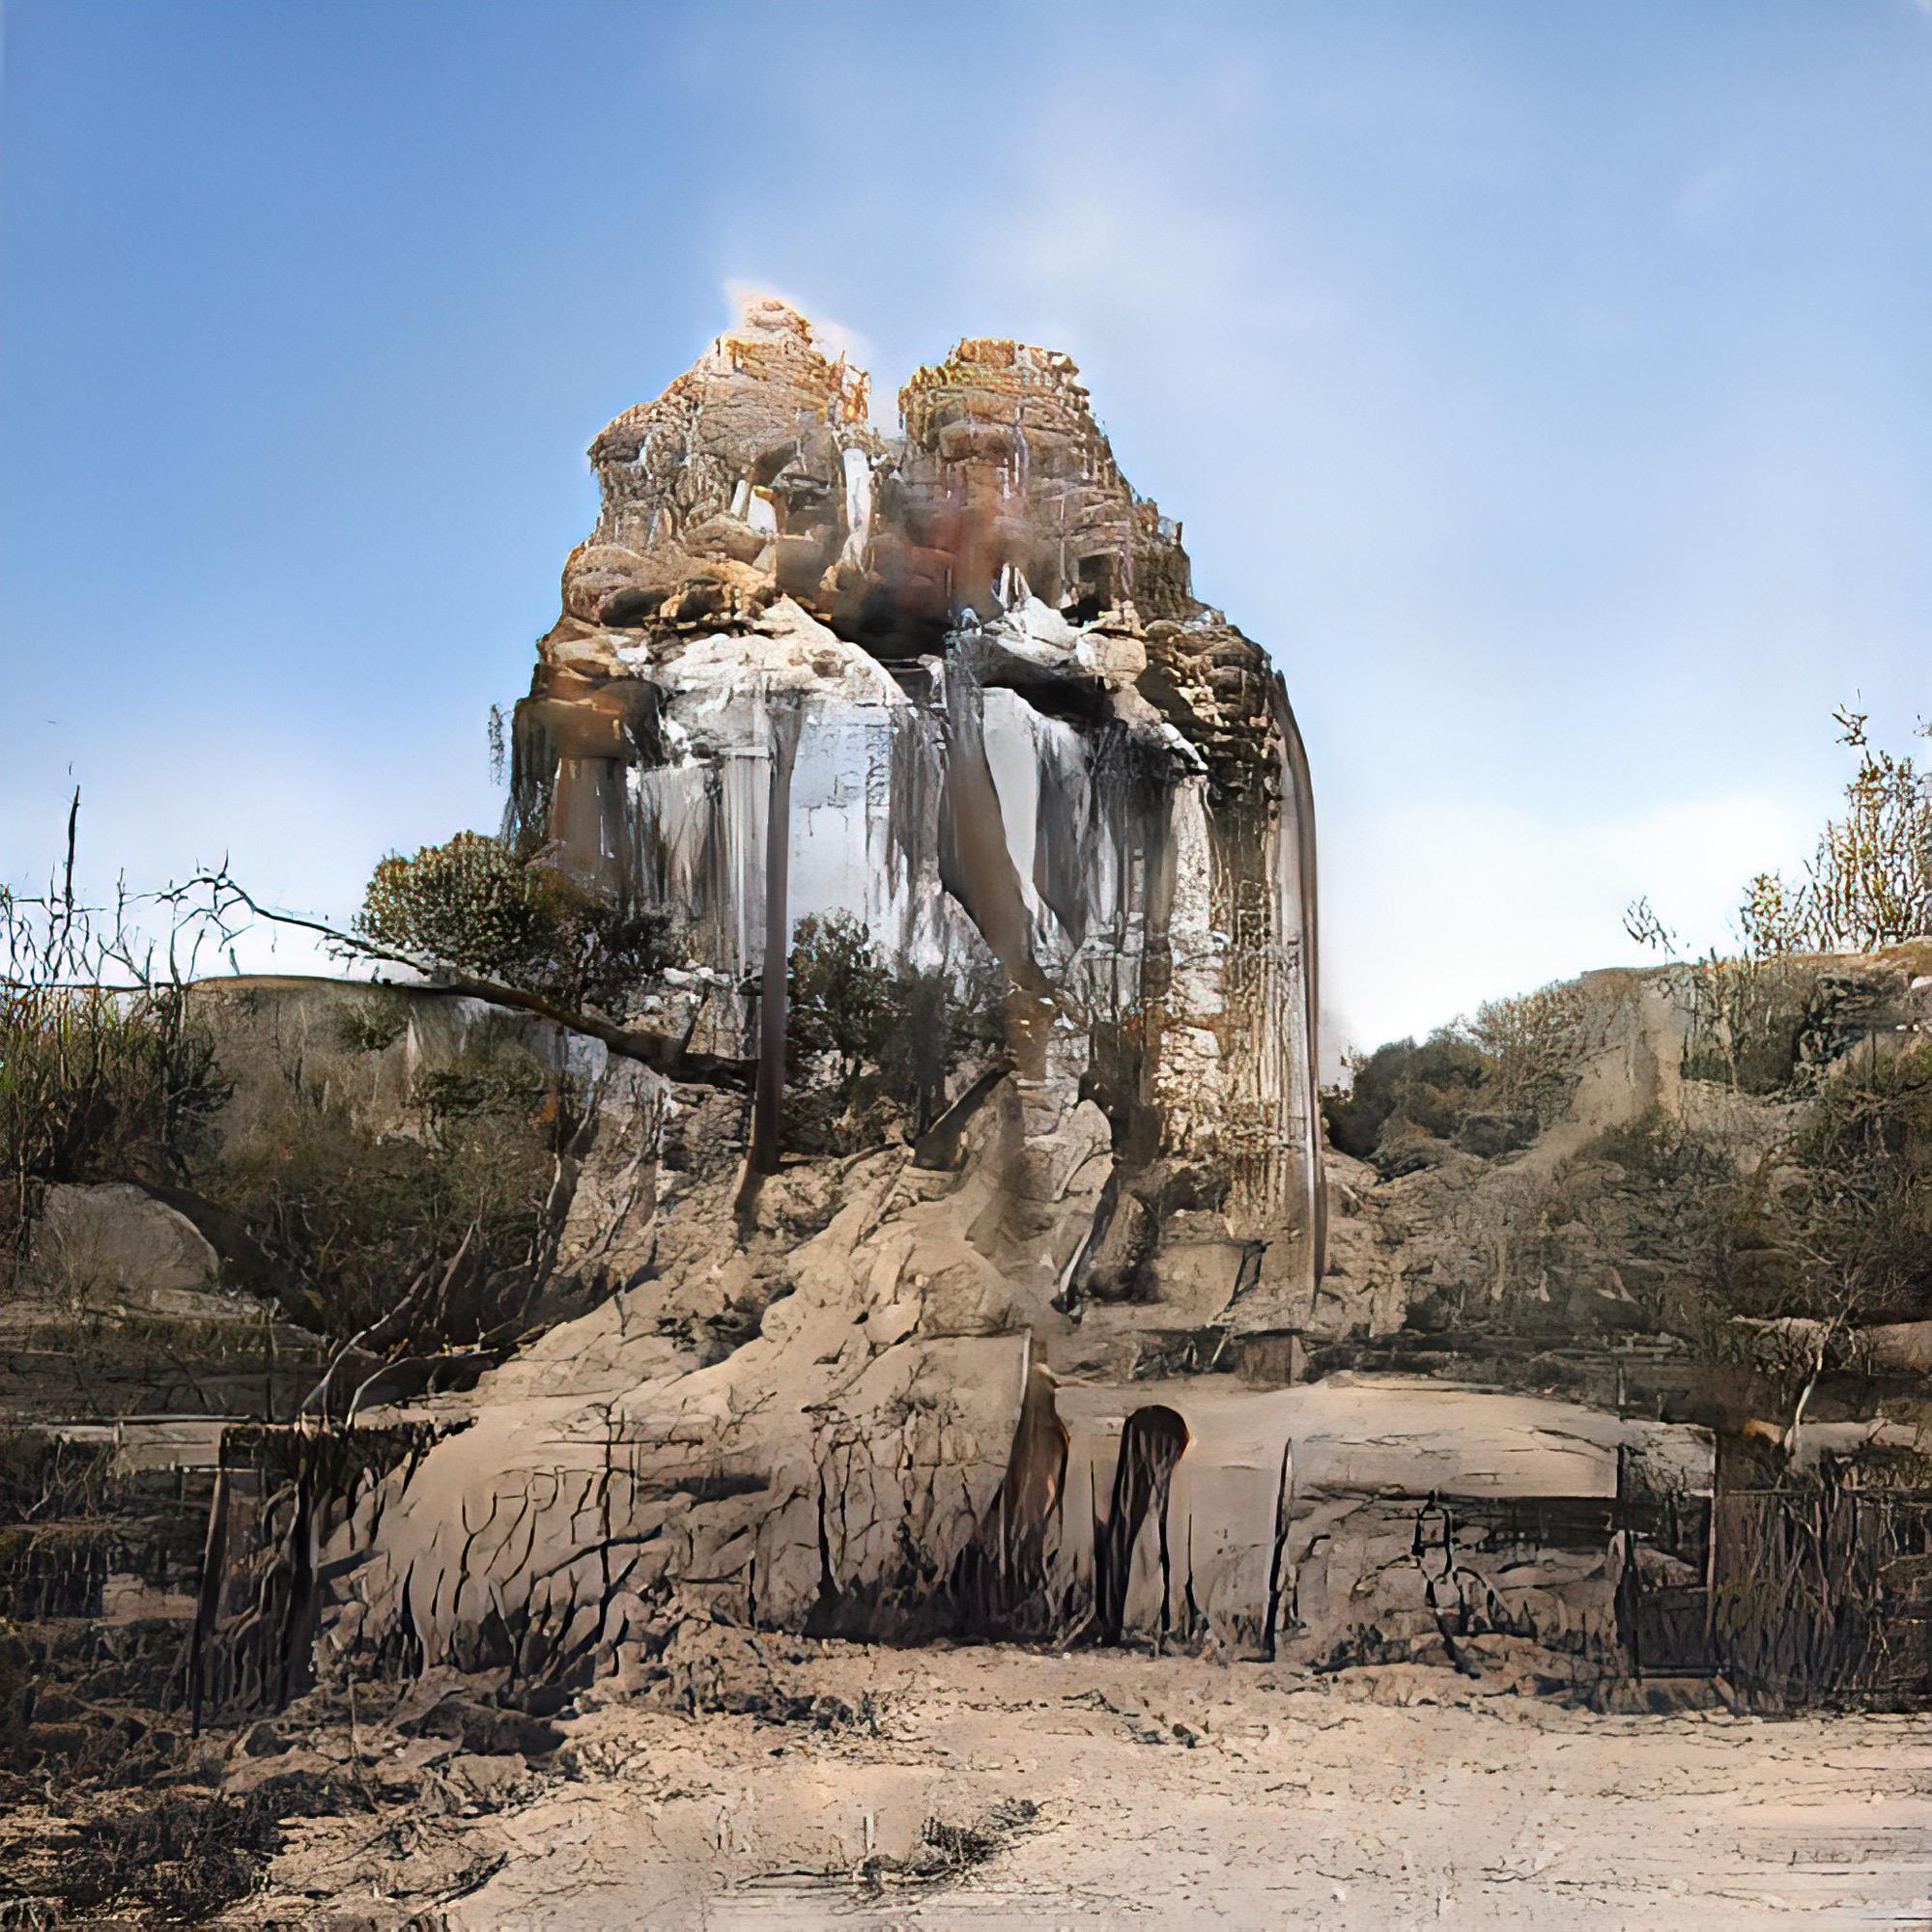 reflective rock desert landscape